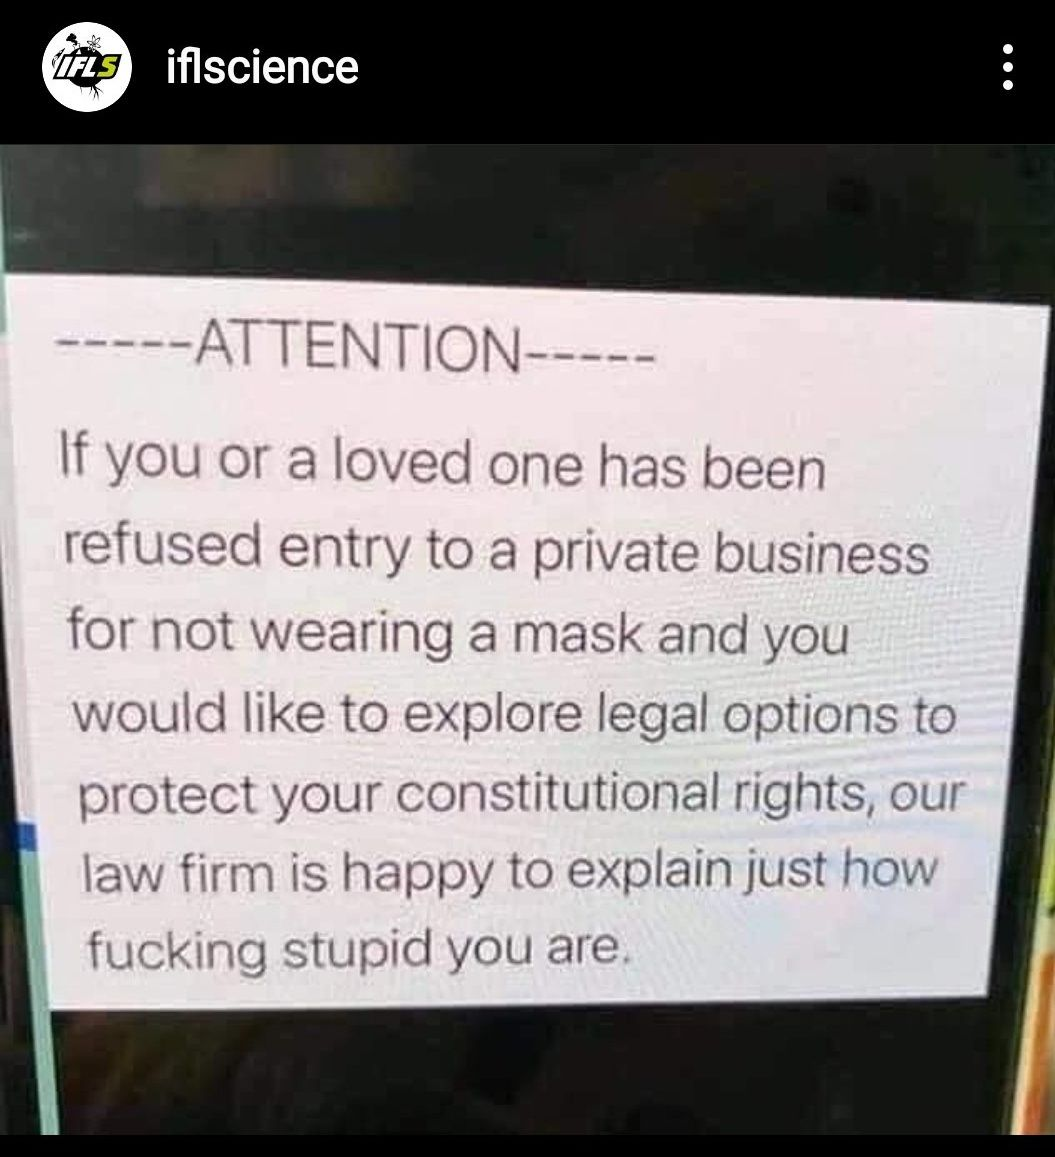 Seen on my instagram feed. From iflscience post.